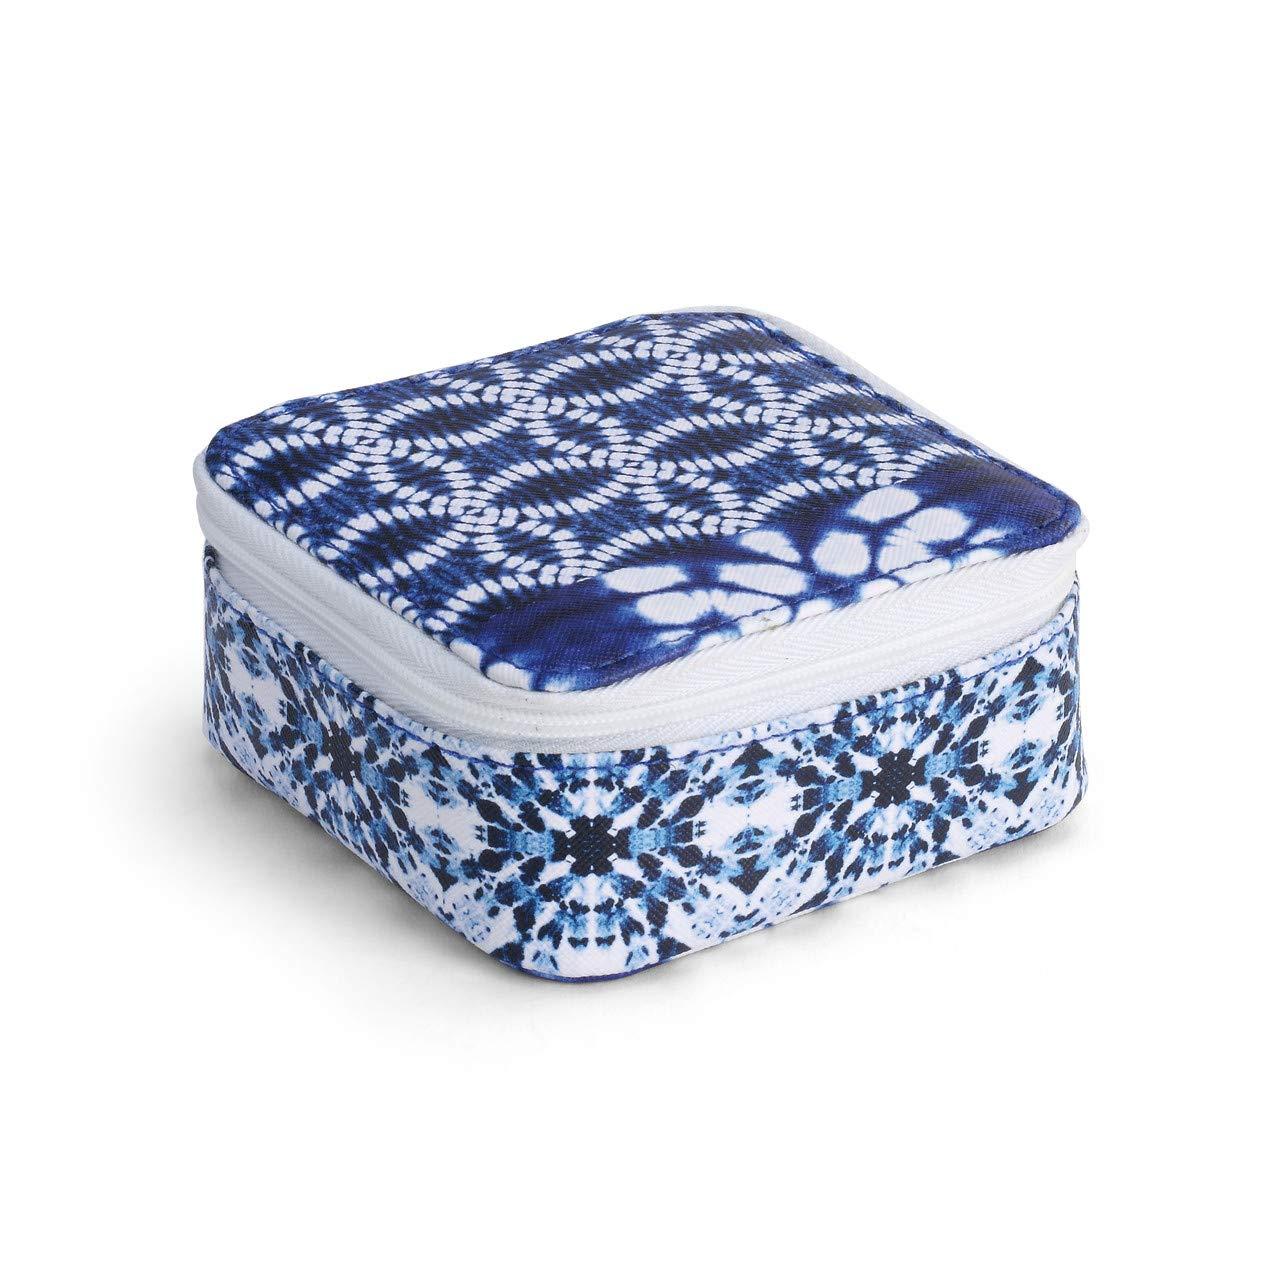 DEMDACO Shibori 图案 靛蓝 4 x 4 人造皮革尼龙首饰盒